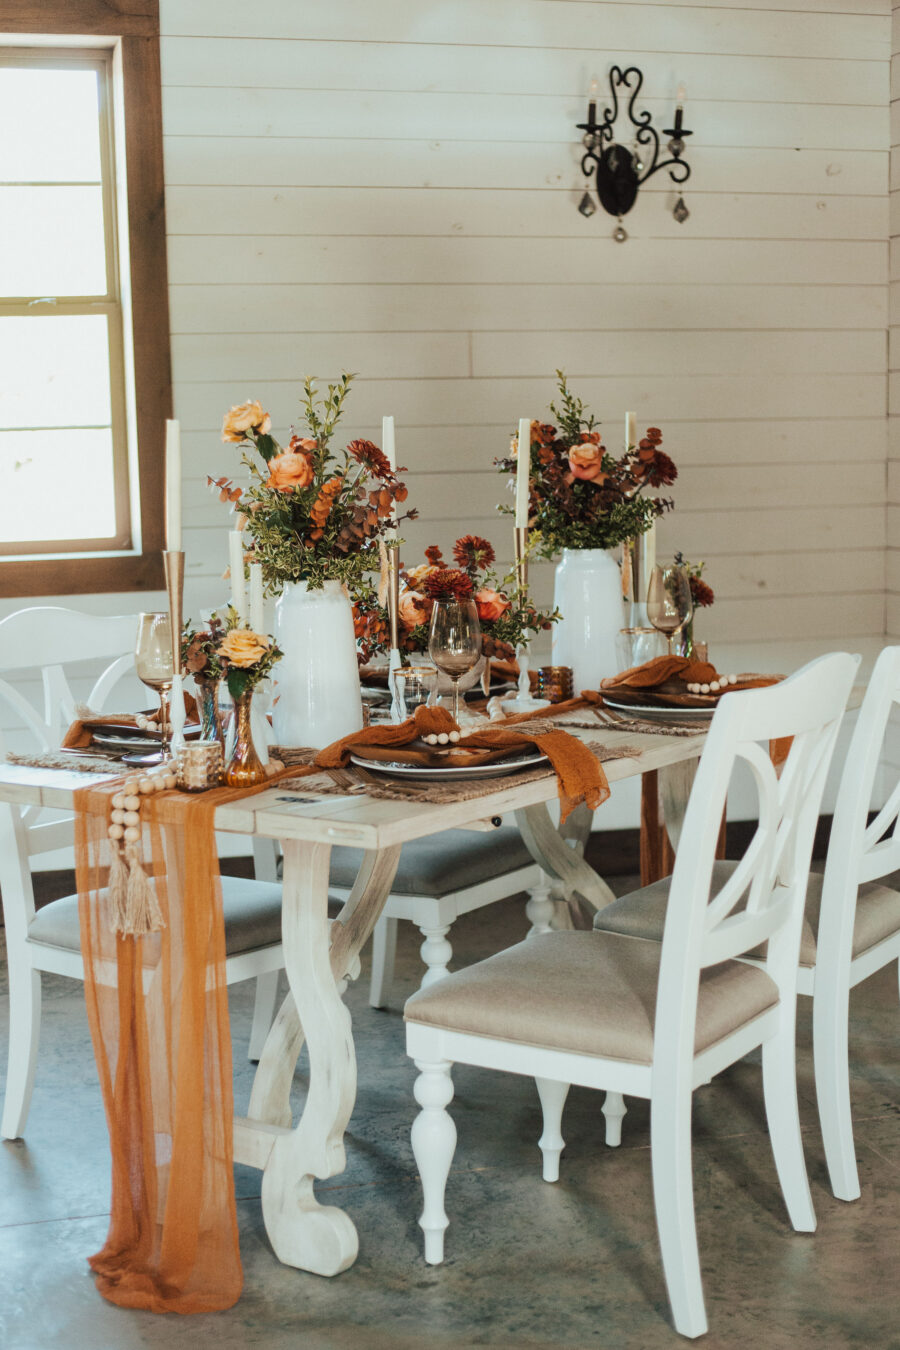 Wedding table decor inspiration: Bright Bohemian Photo Shoot from Ina J Designs